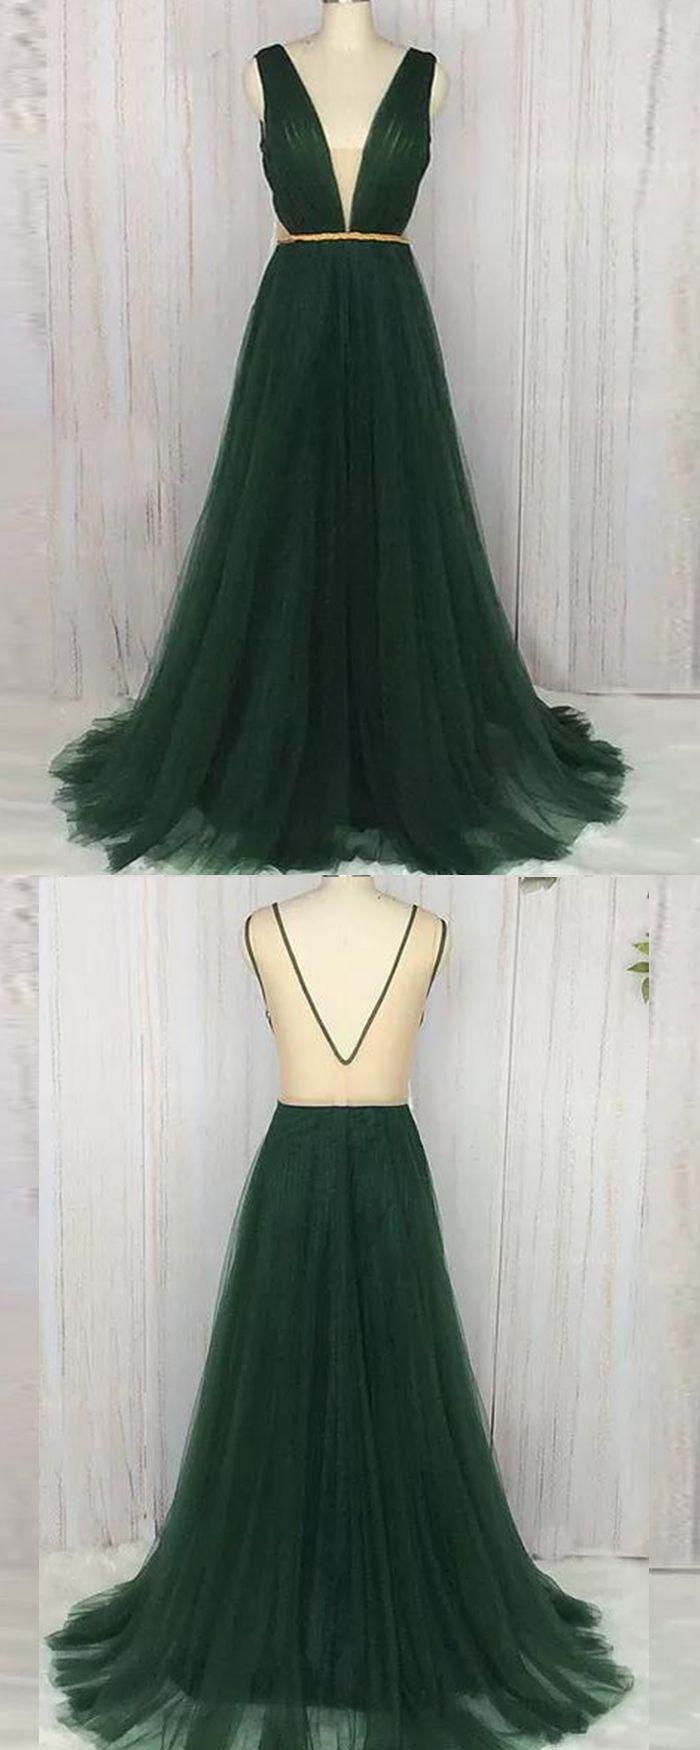 Deep vneck ruched dark green tulle long formal dress pm in